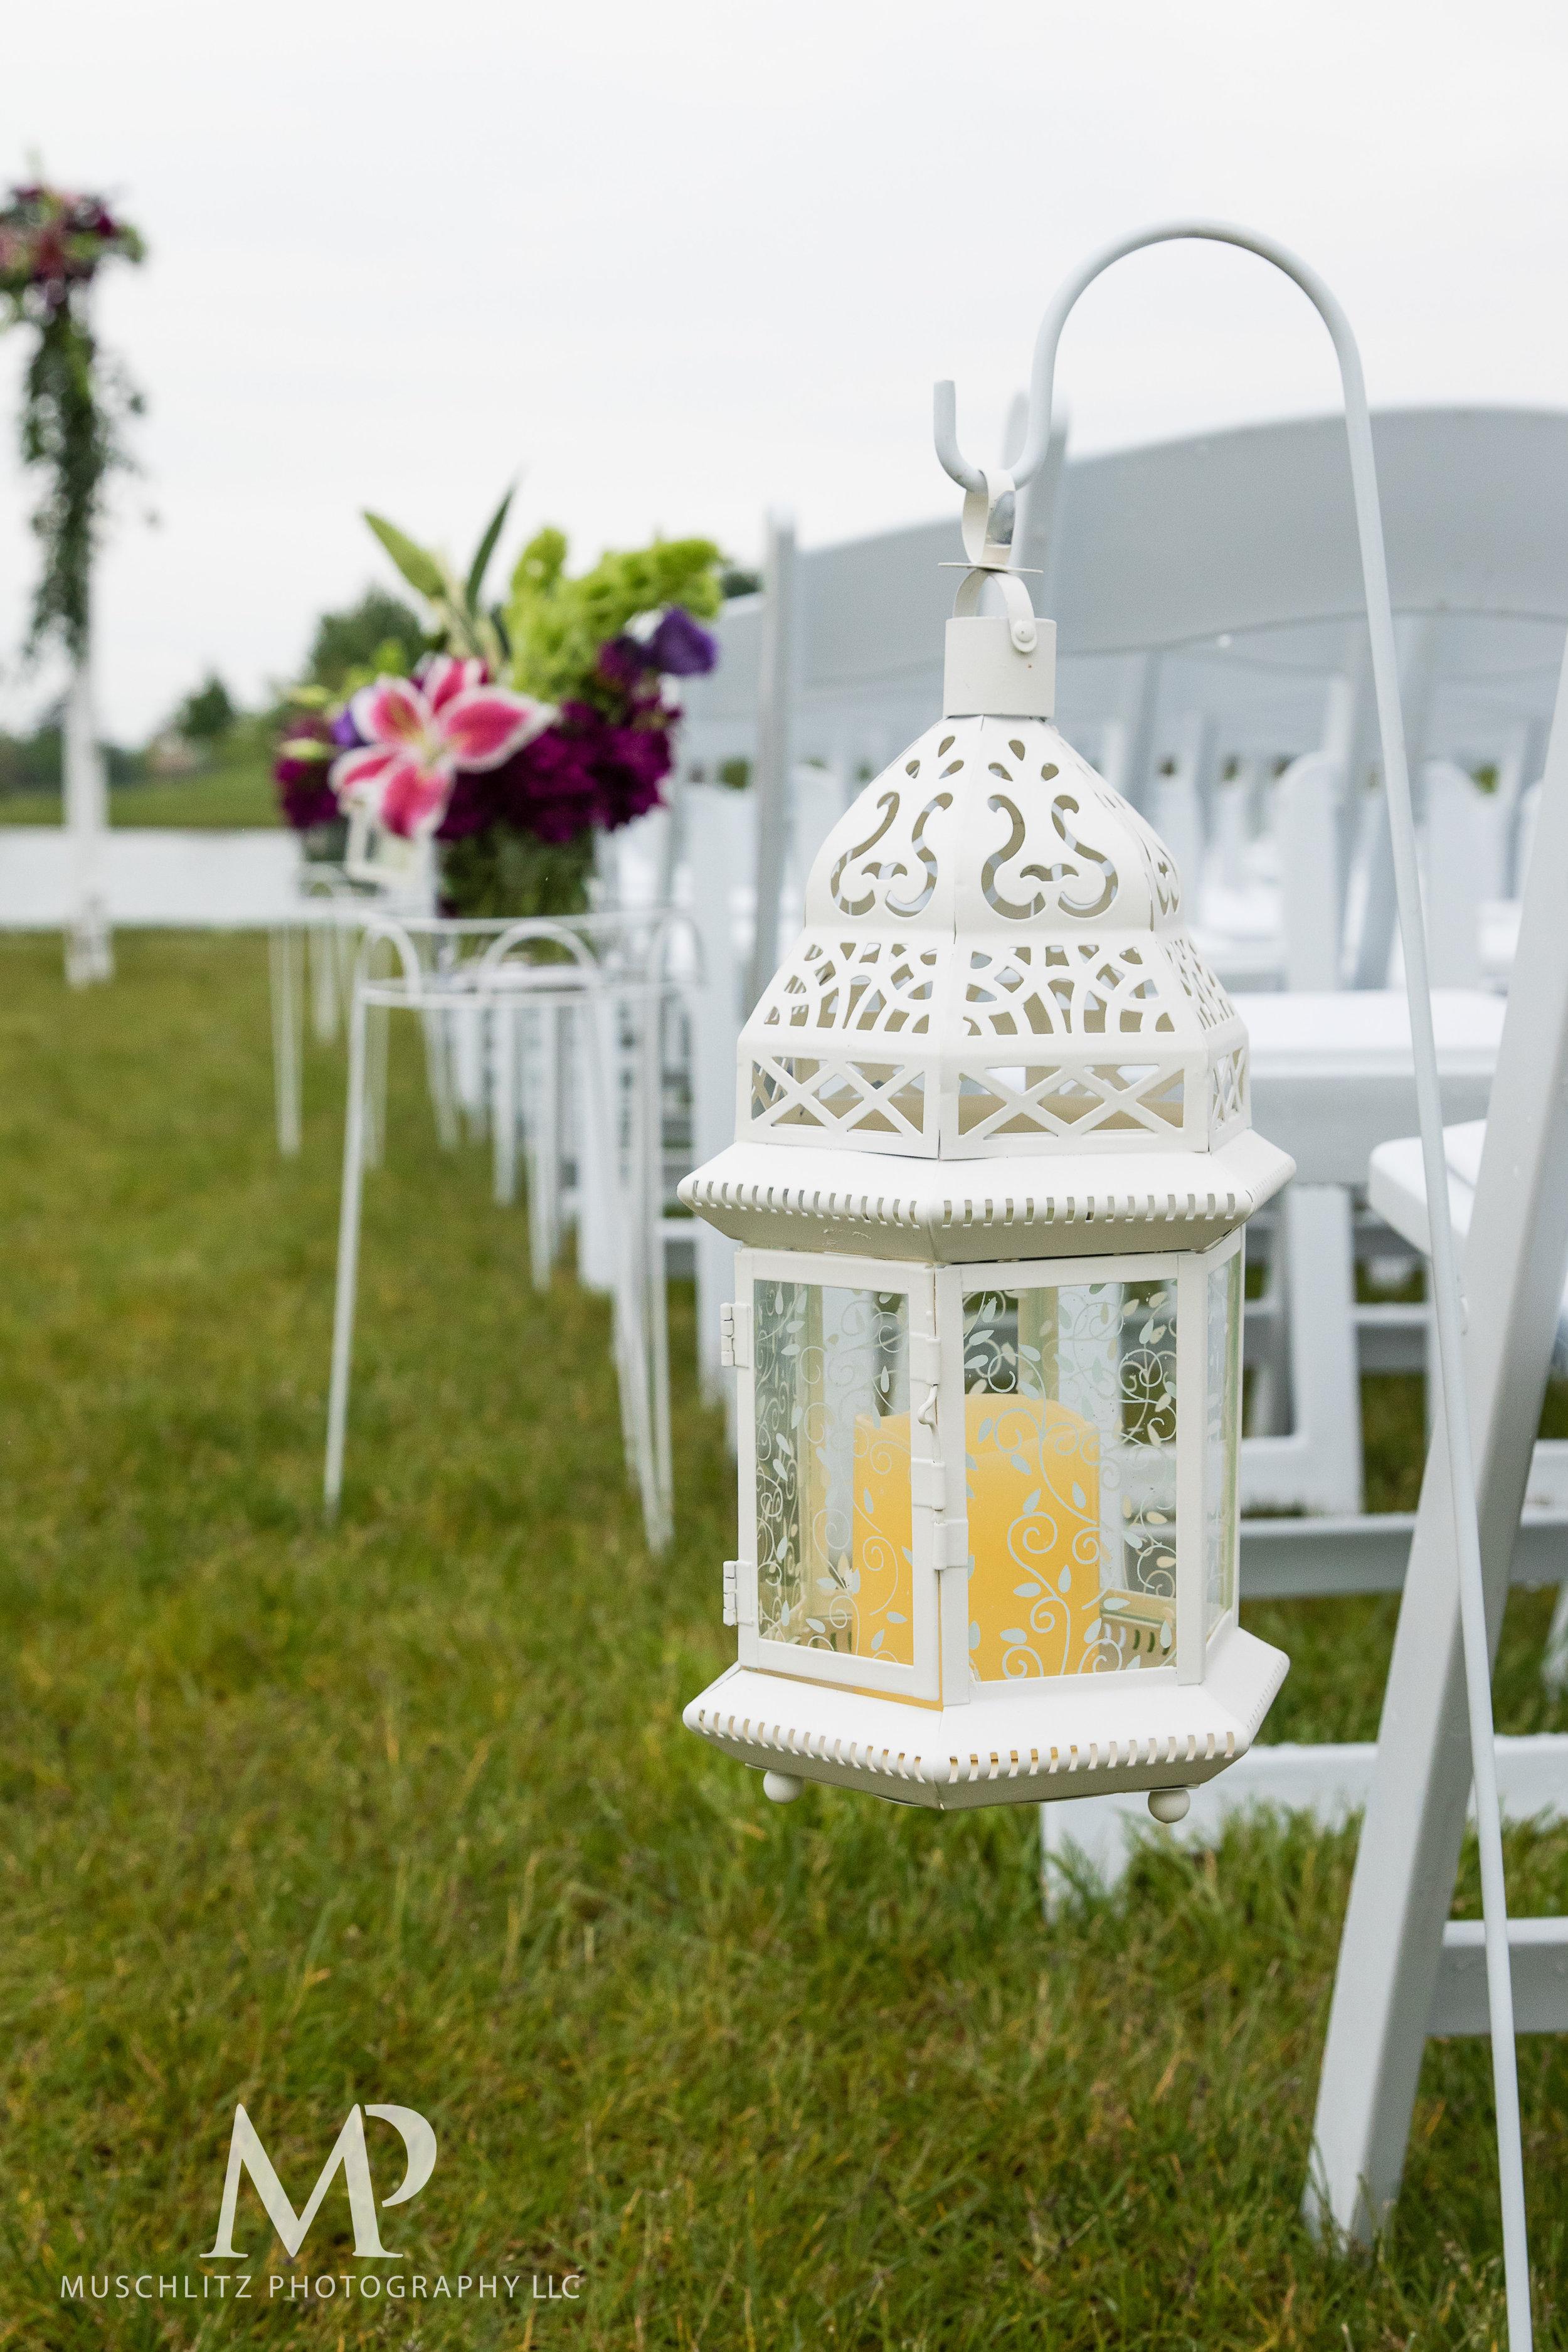 club-at-corazon-wedding-ceremony-reception-columbus-dublin-ohio-ohio-university-theme-022.JPG